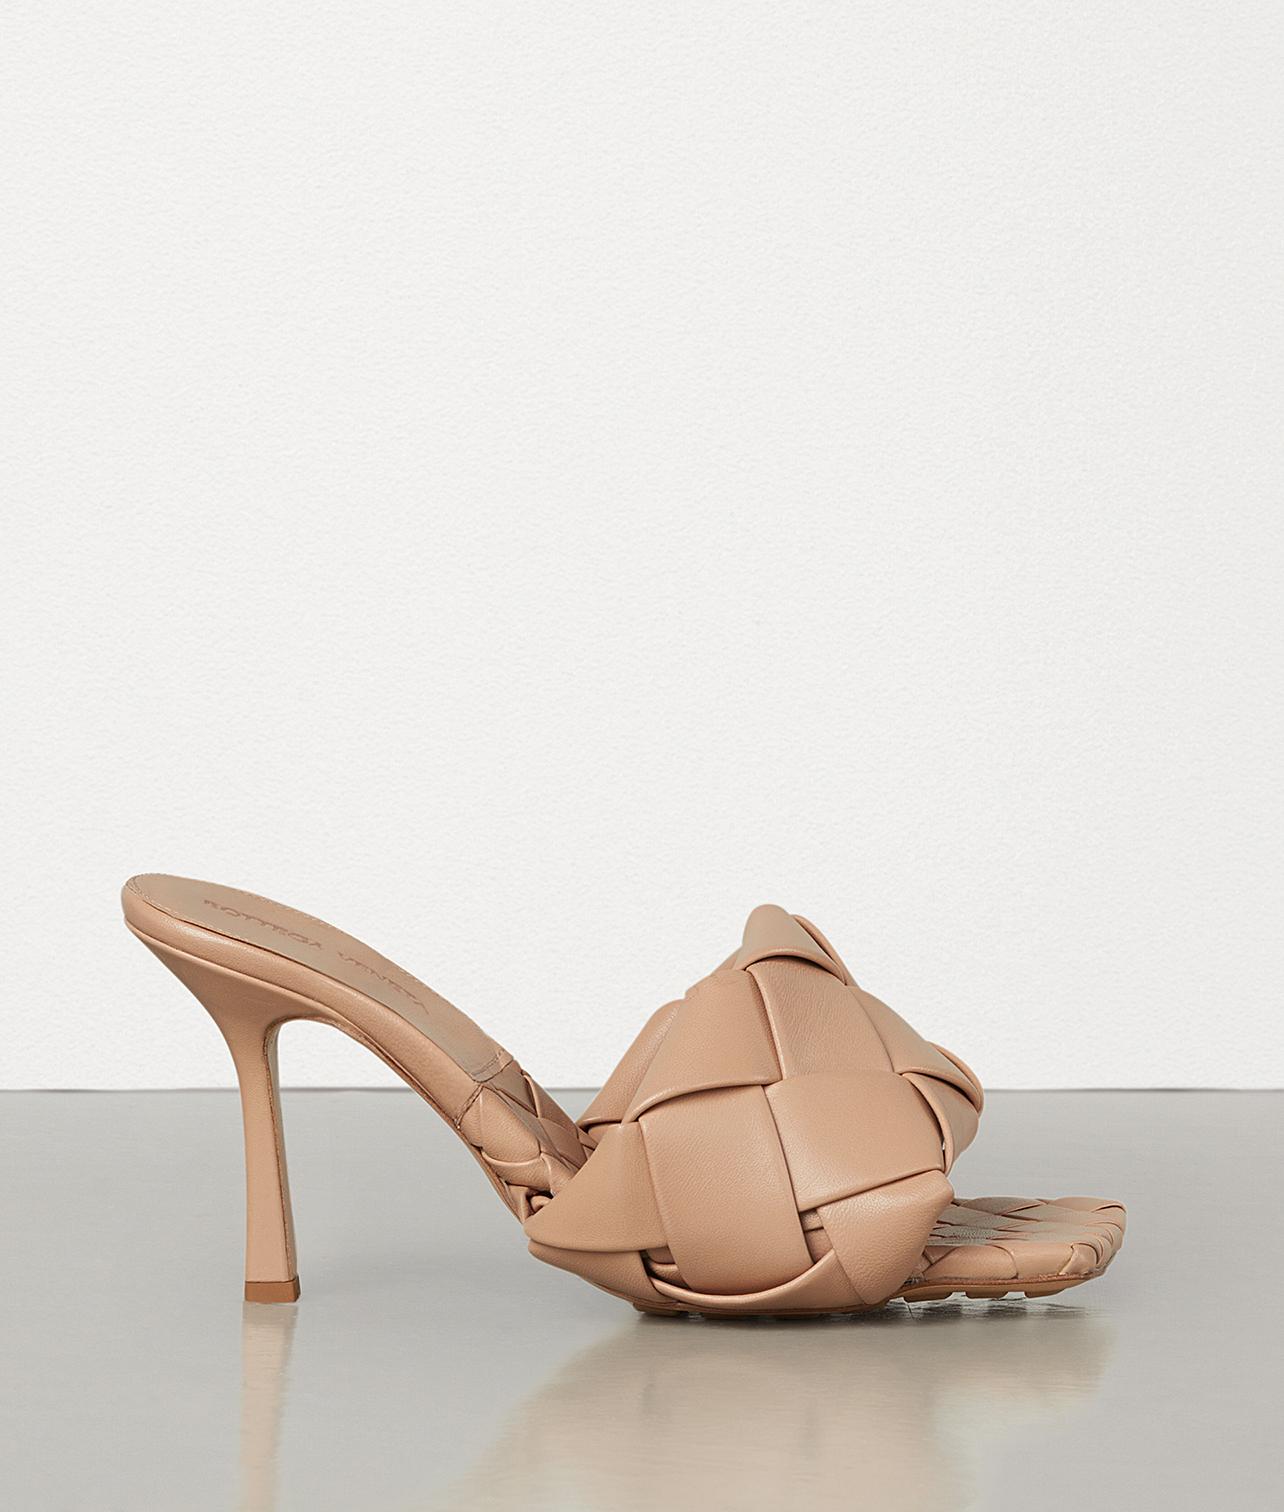 Bottega Veneta® - LIDO SANDALS   Slipper shoes women